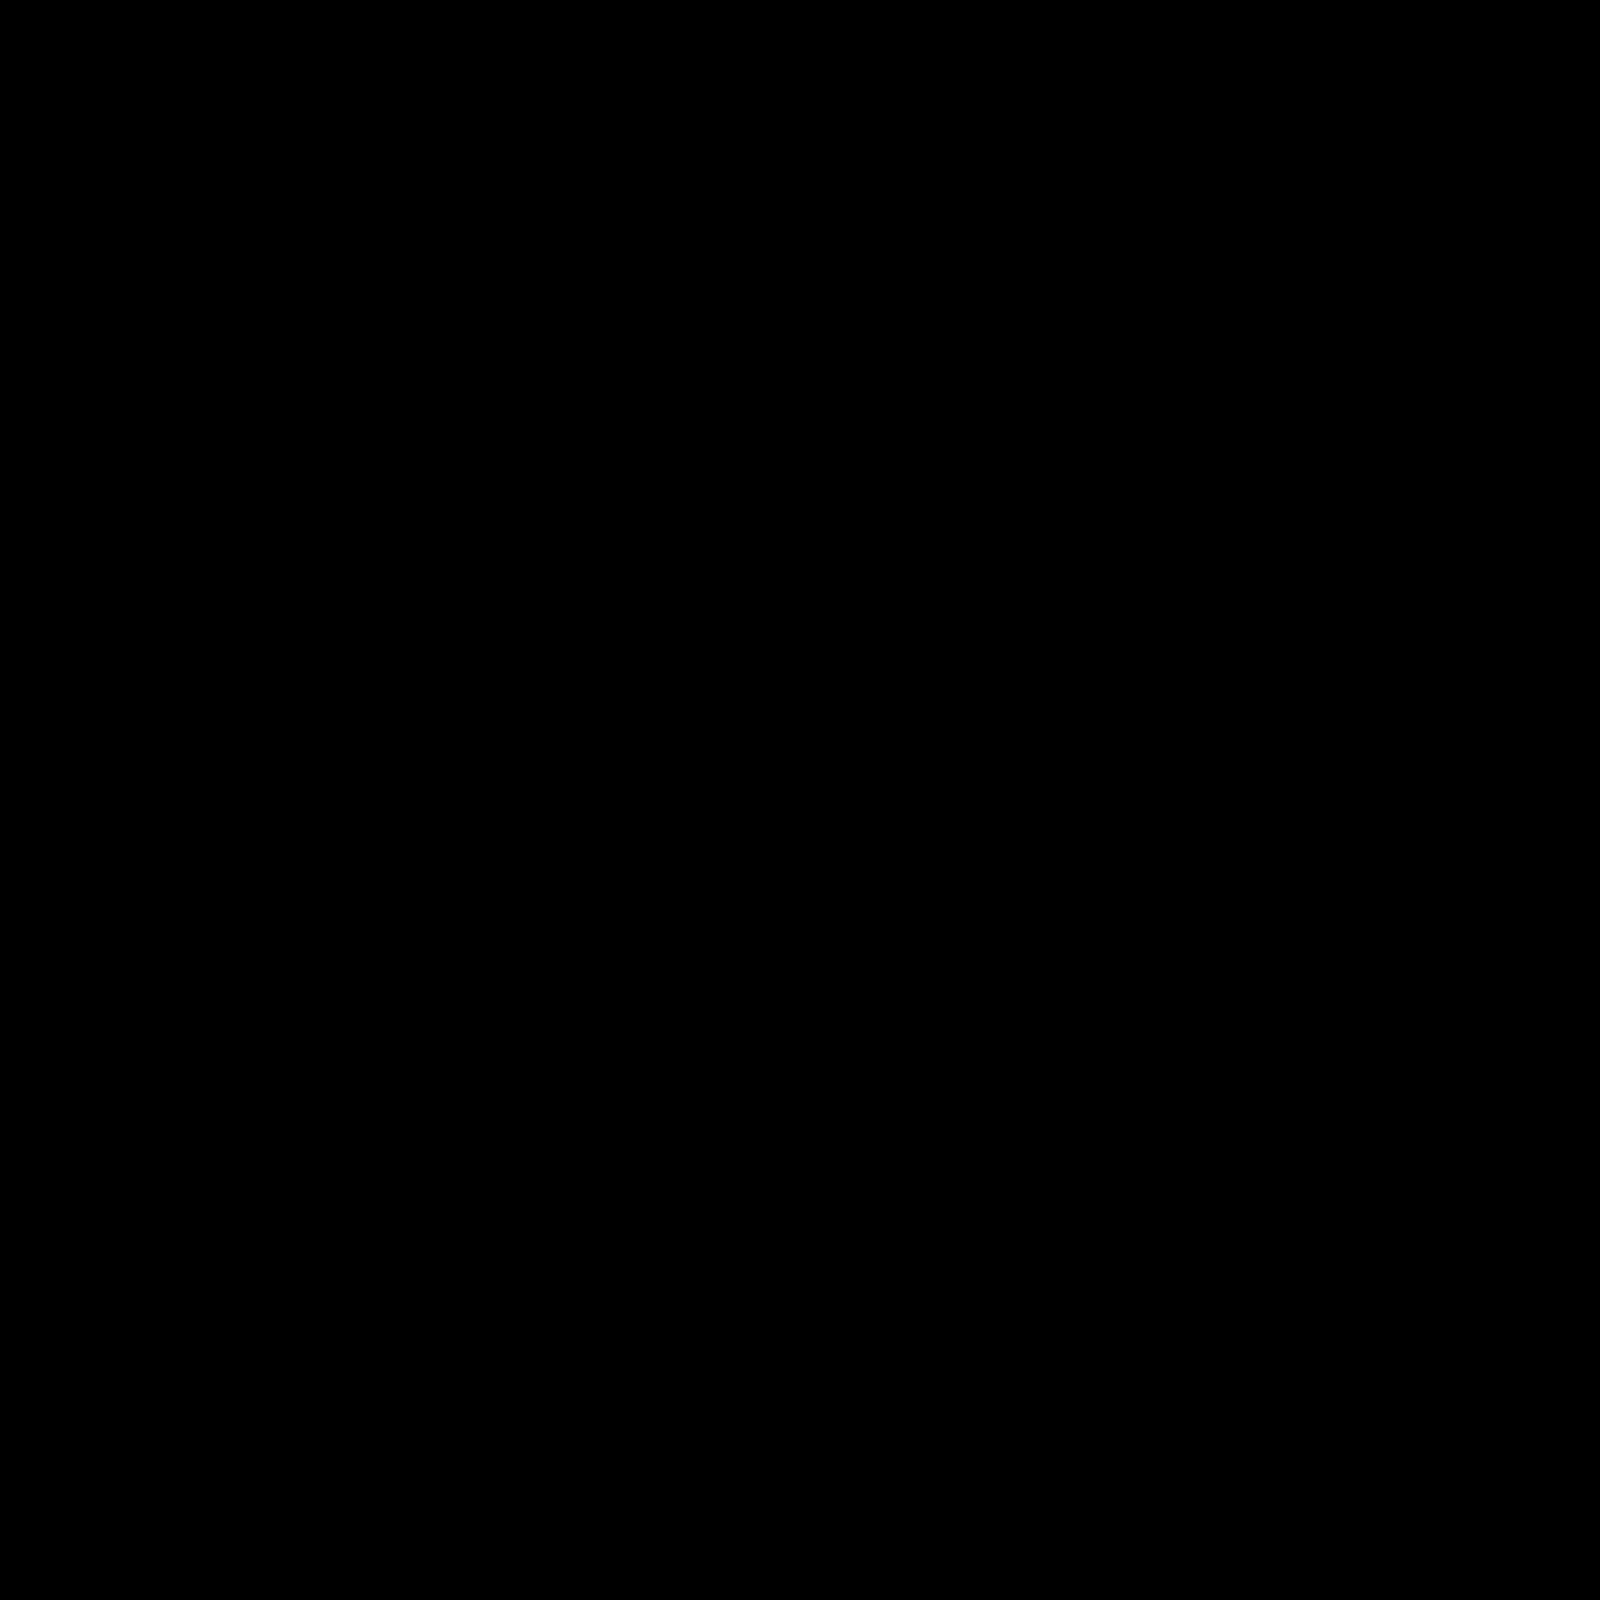 Rezar icon